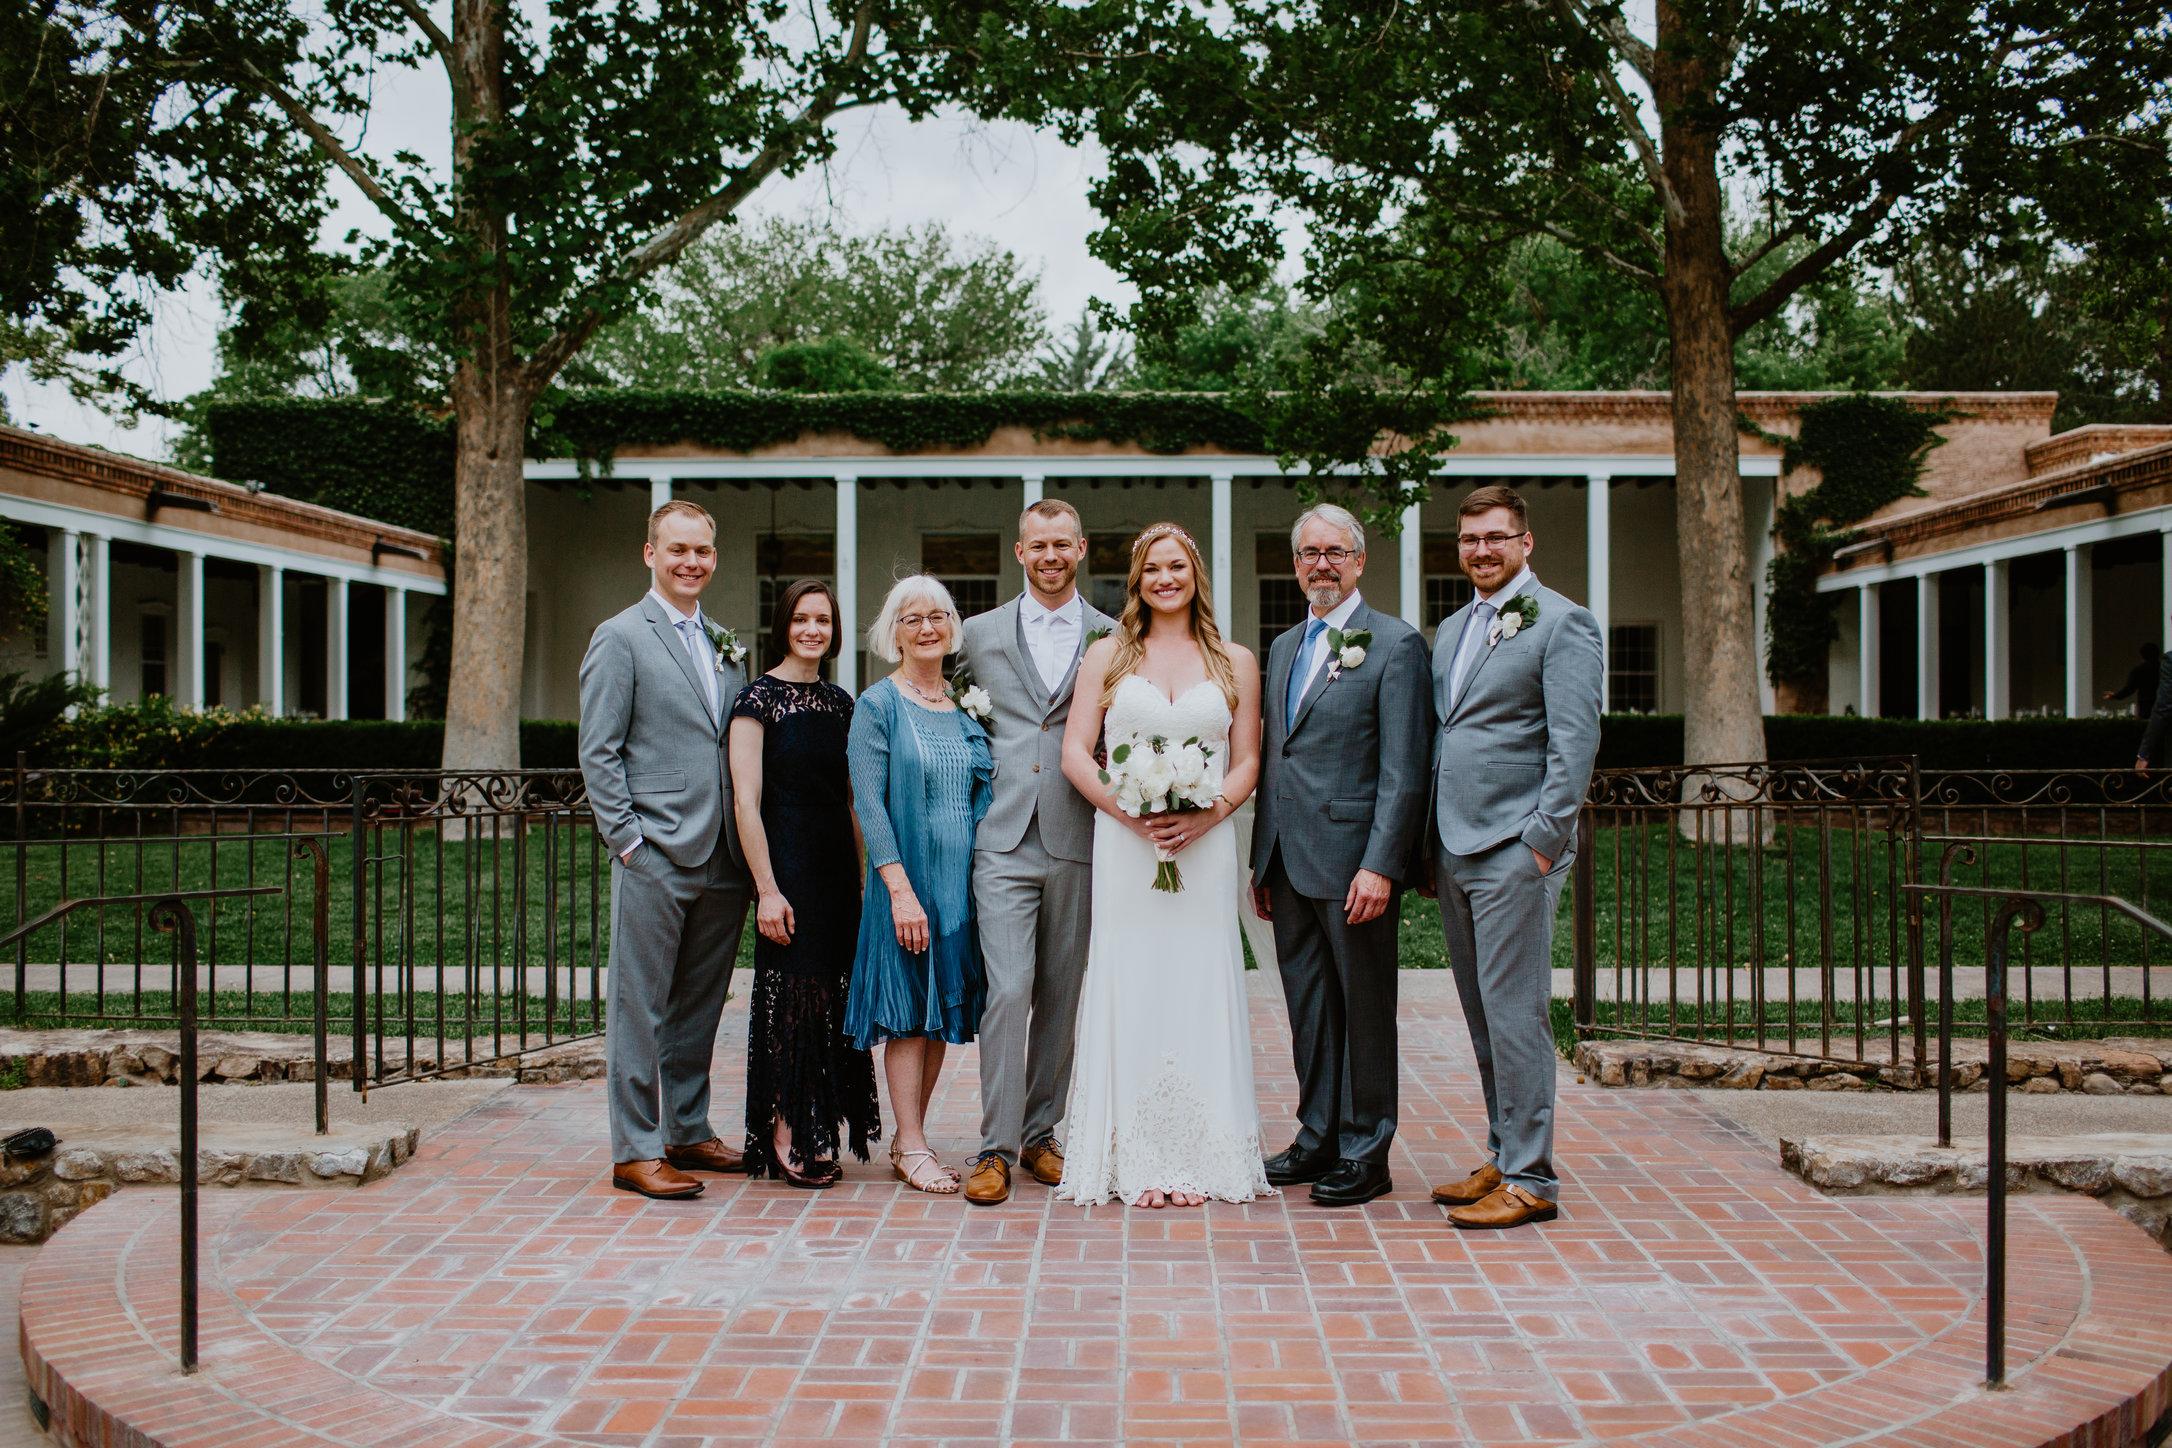 DandA-wedding-483.jpg